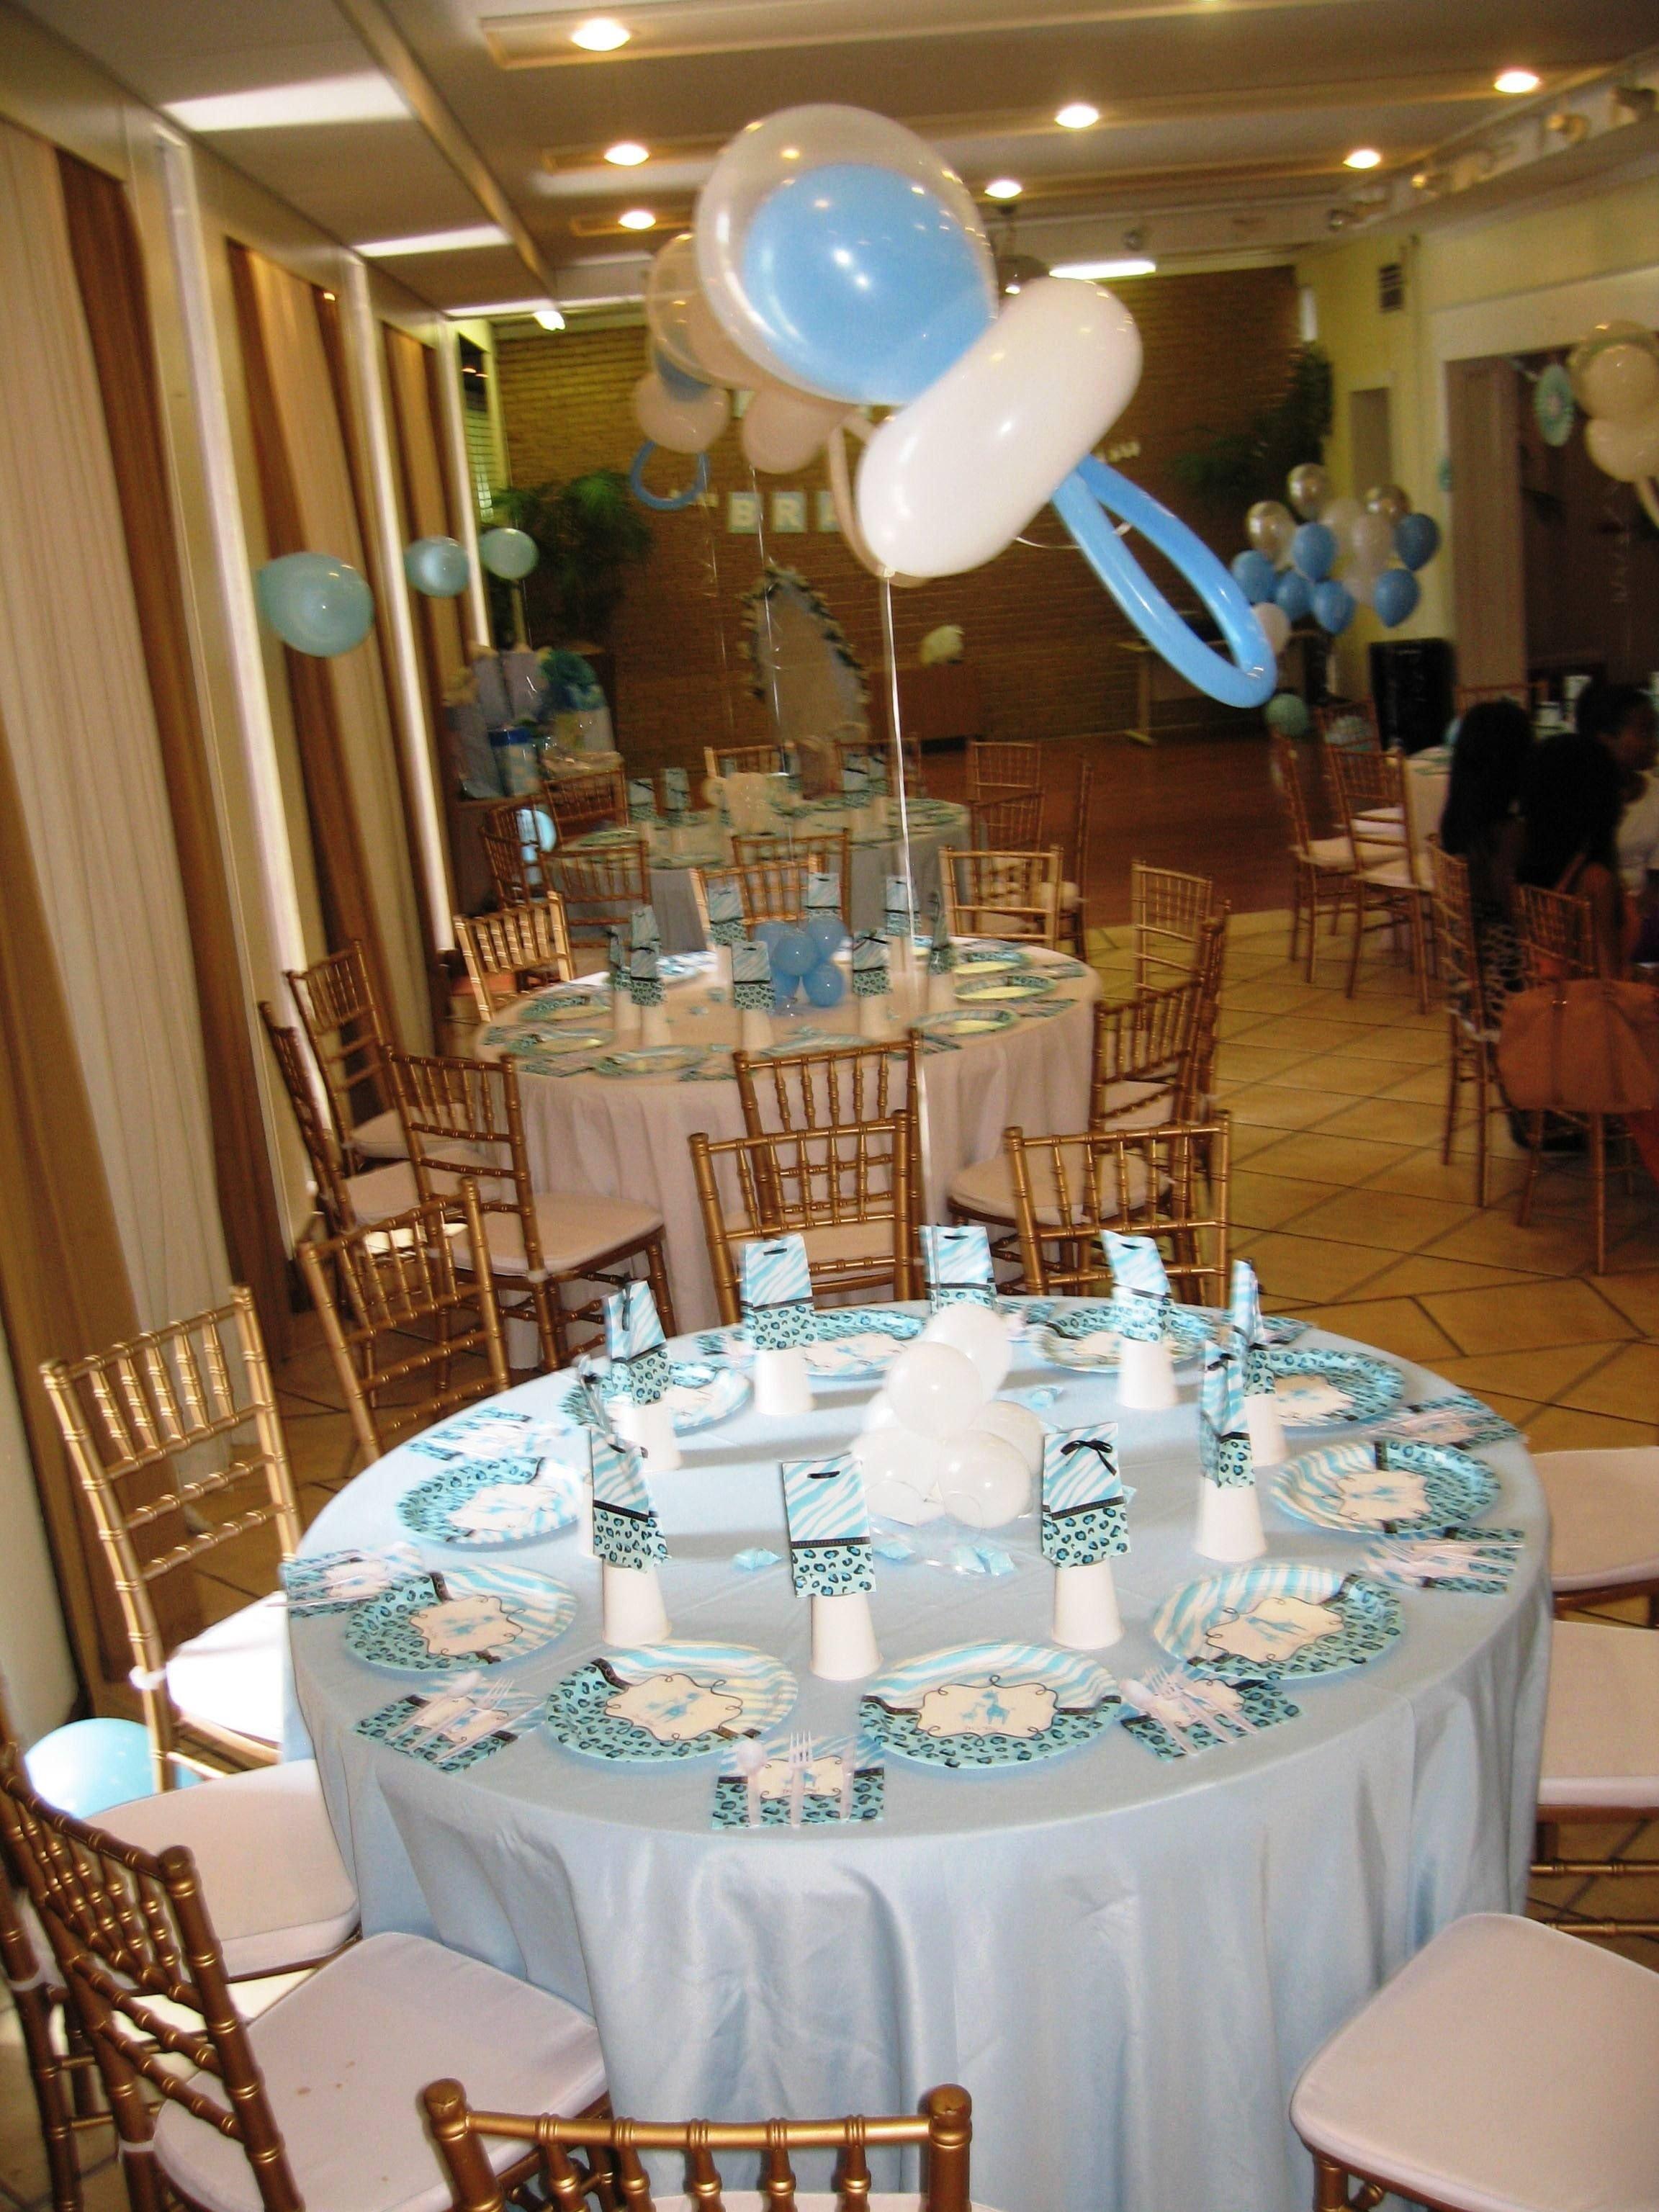 10 Most Popular Baby Shower Table Centerpiece Ideas baby shower table decor centerpieces table decor pinterest 1 2021